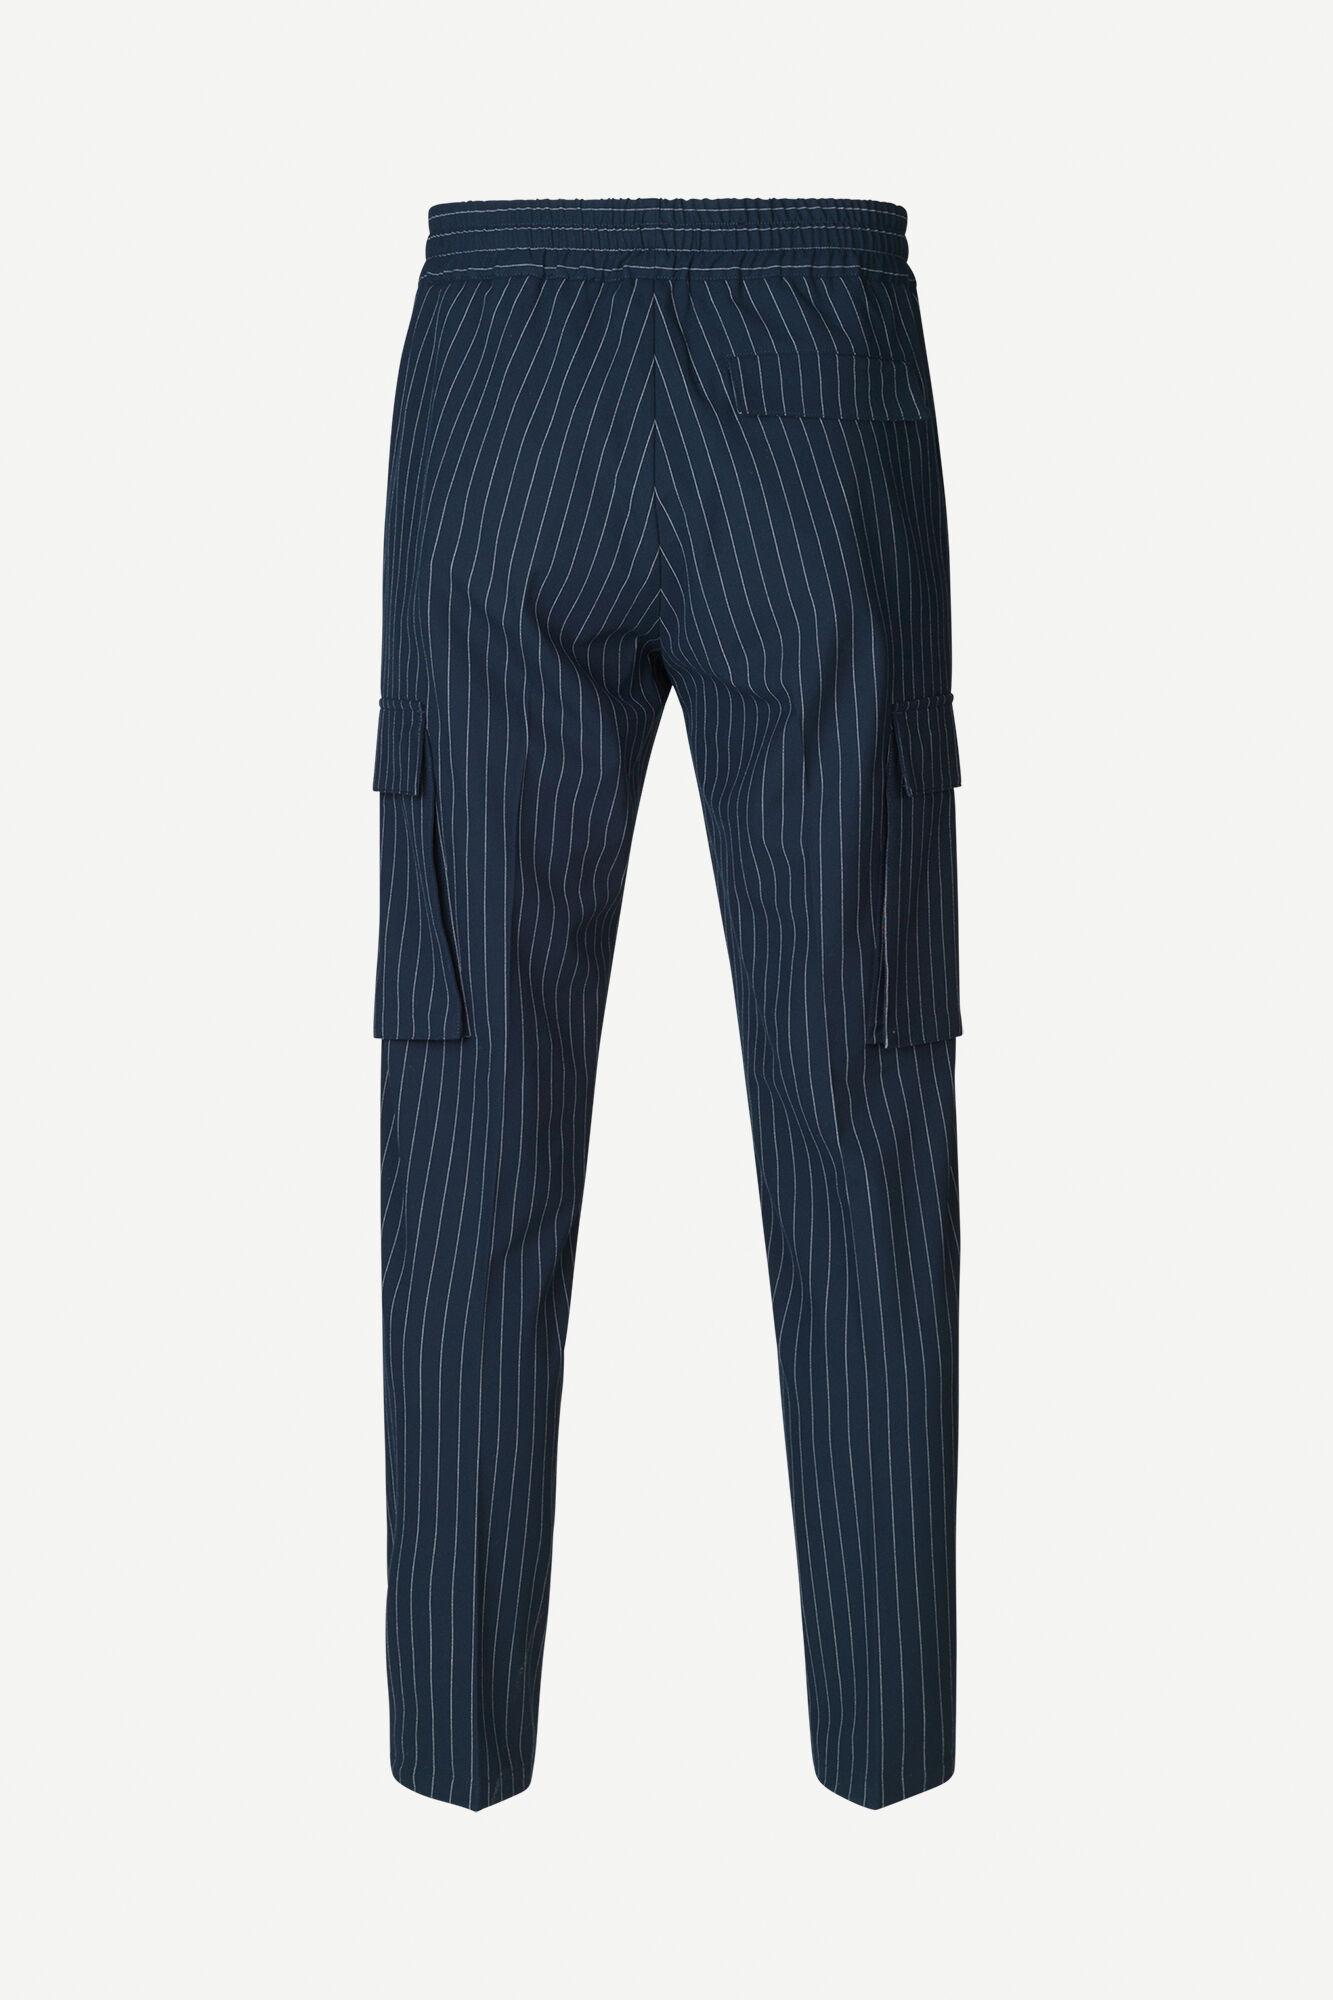 Smithy cargo trousers 11203, SKY CAPTAIN ST.